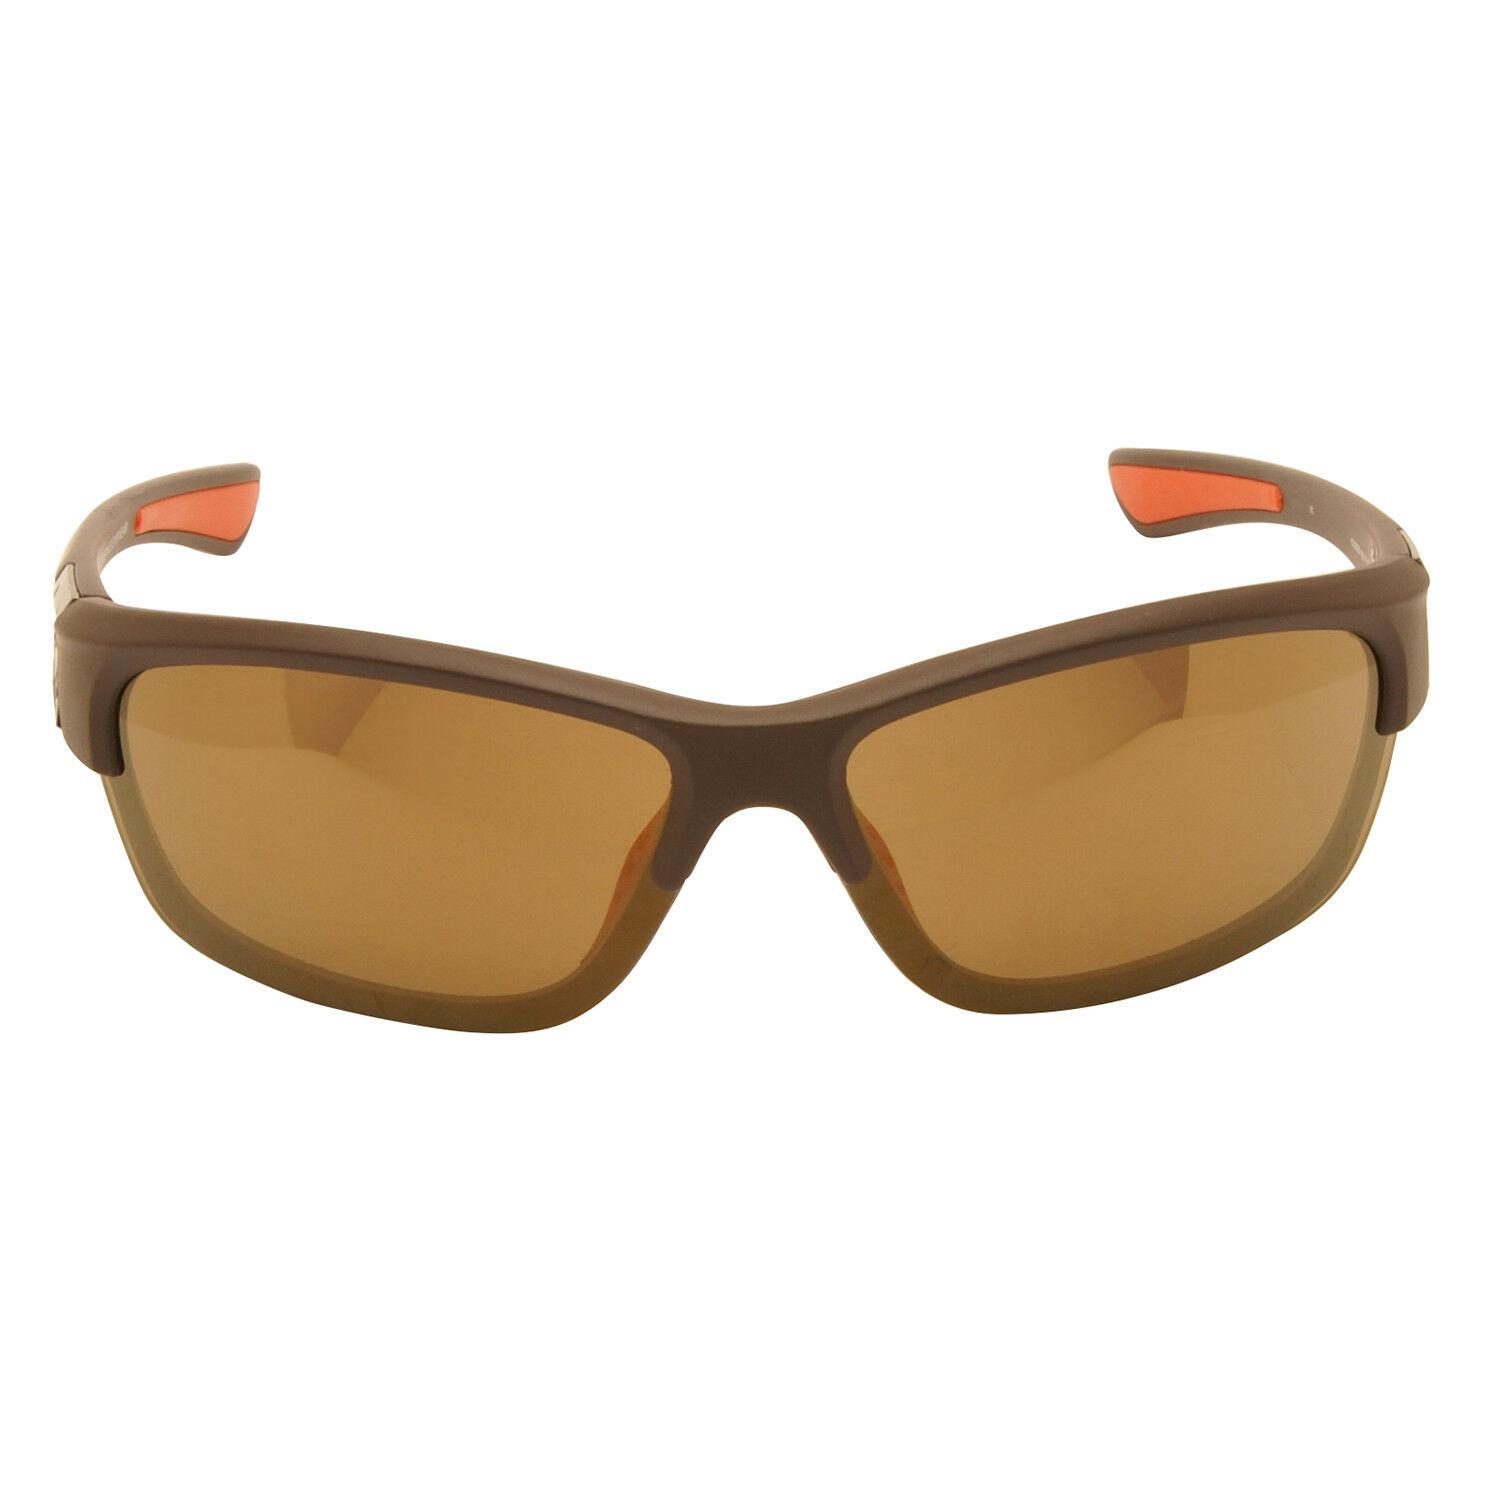 Harley Davidson – Matt Brown Wraparound Style Sunglasses with Case